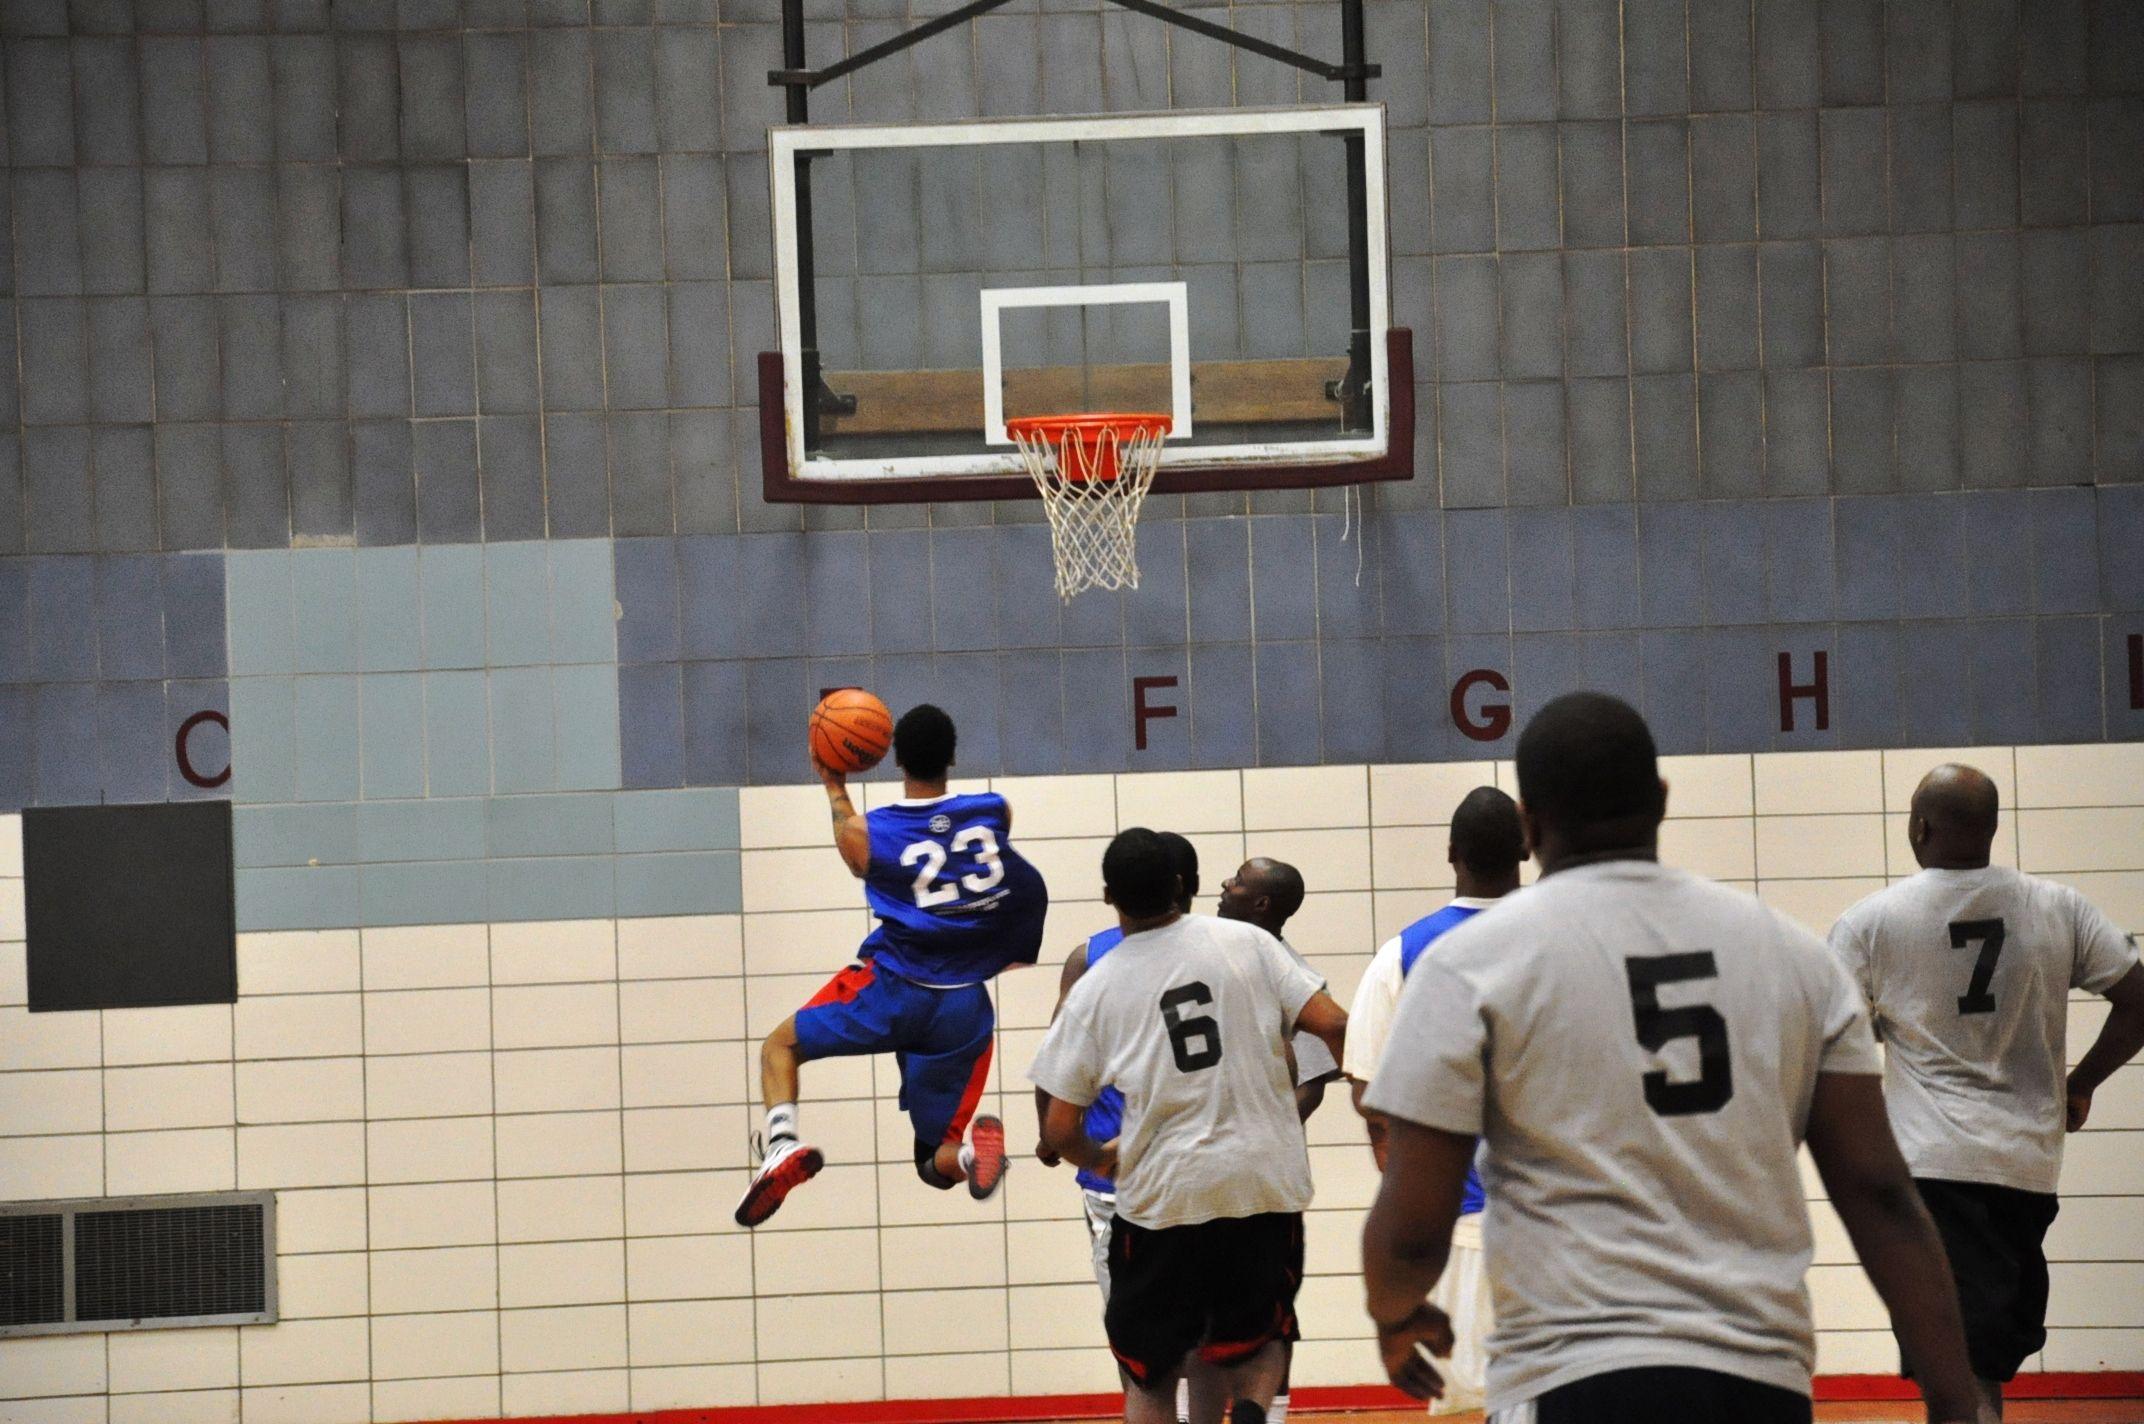 ABC Hoops - Indoor Pickup Basketball